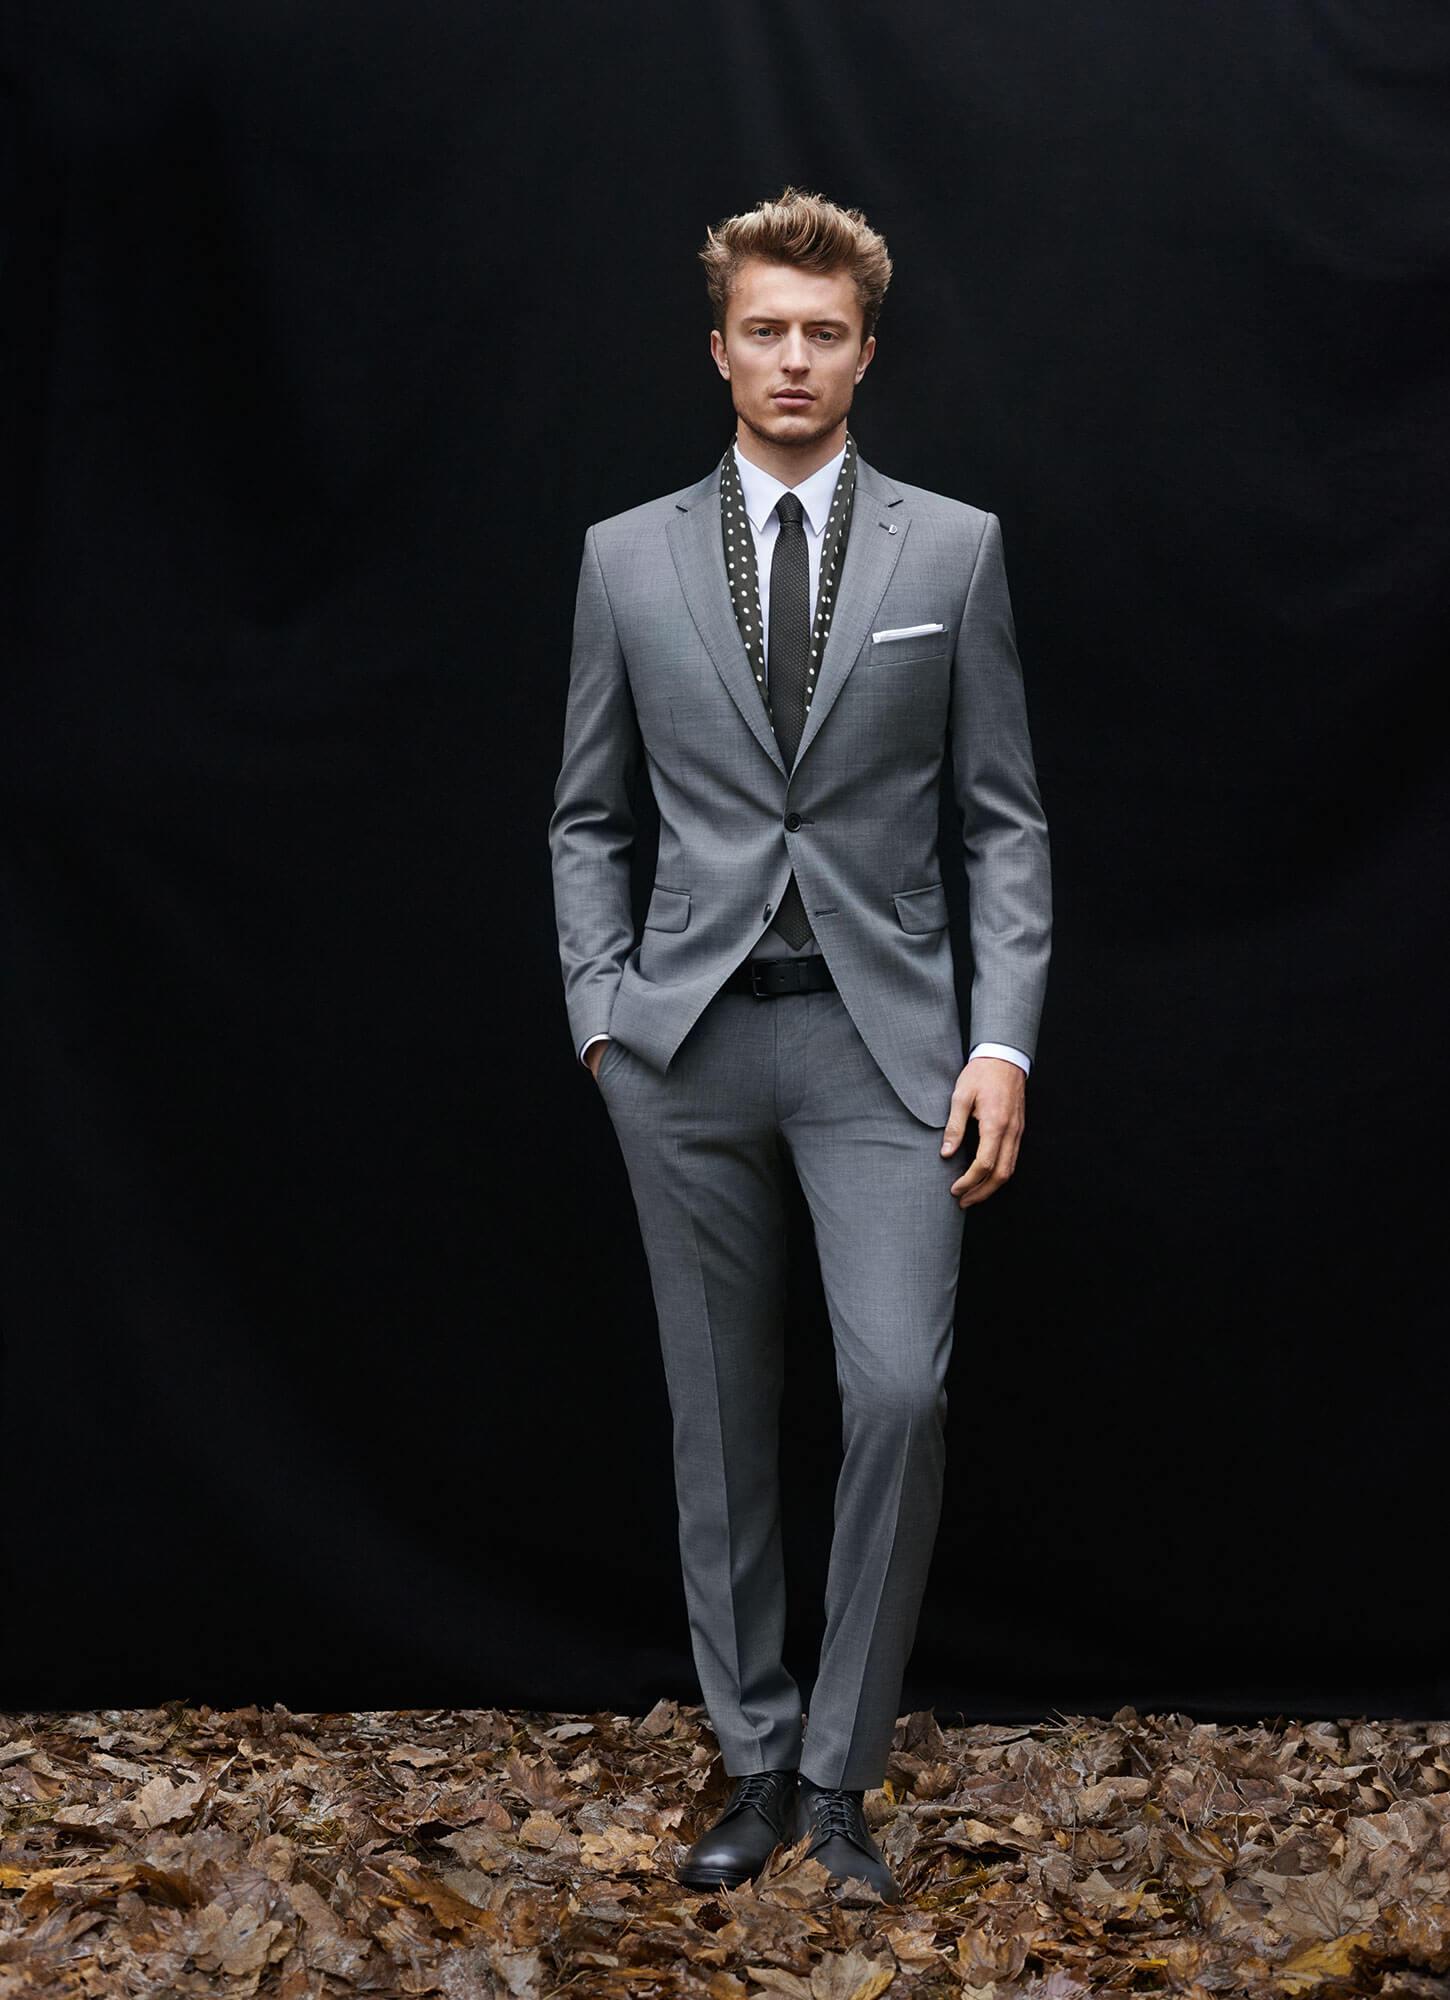 35f289a1527ca Plus Modne męskie koszule i garnitury - Digel Autumn/Winter Collection 2016